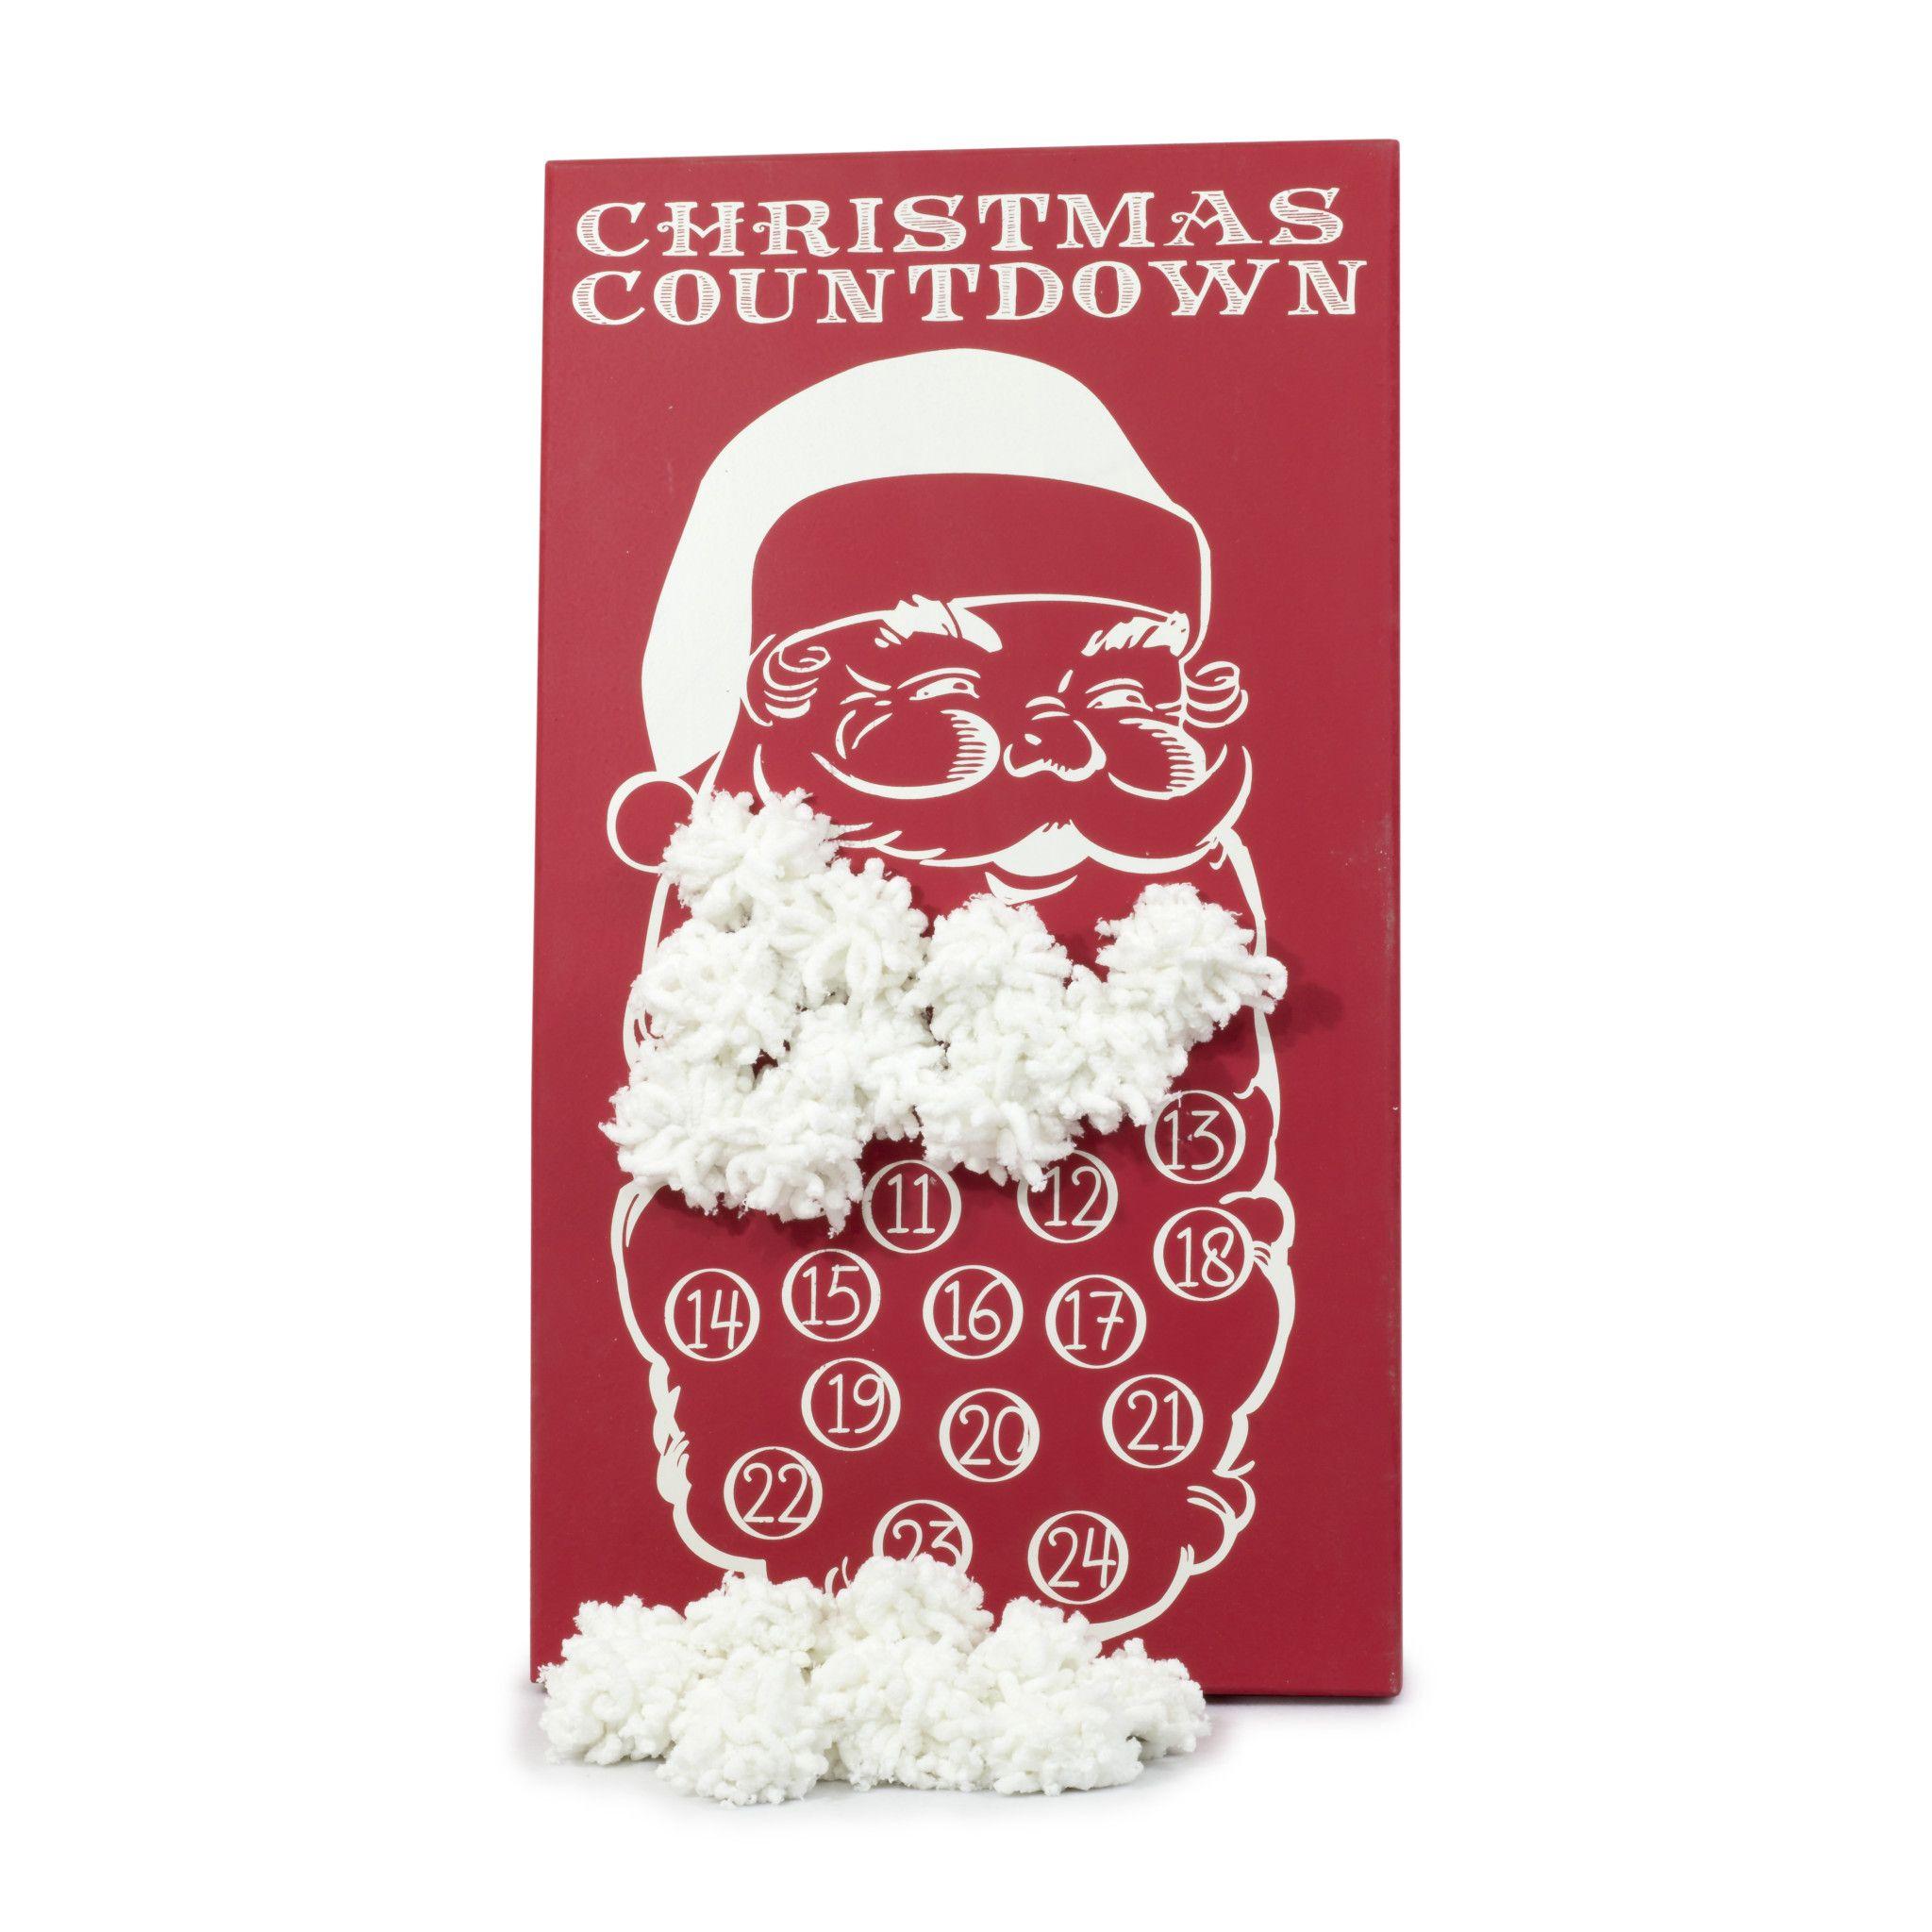 Image result for COUNTDOWN TO CHRISTMAS CALENDAR FRAMED